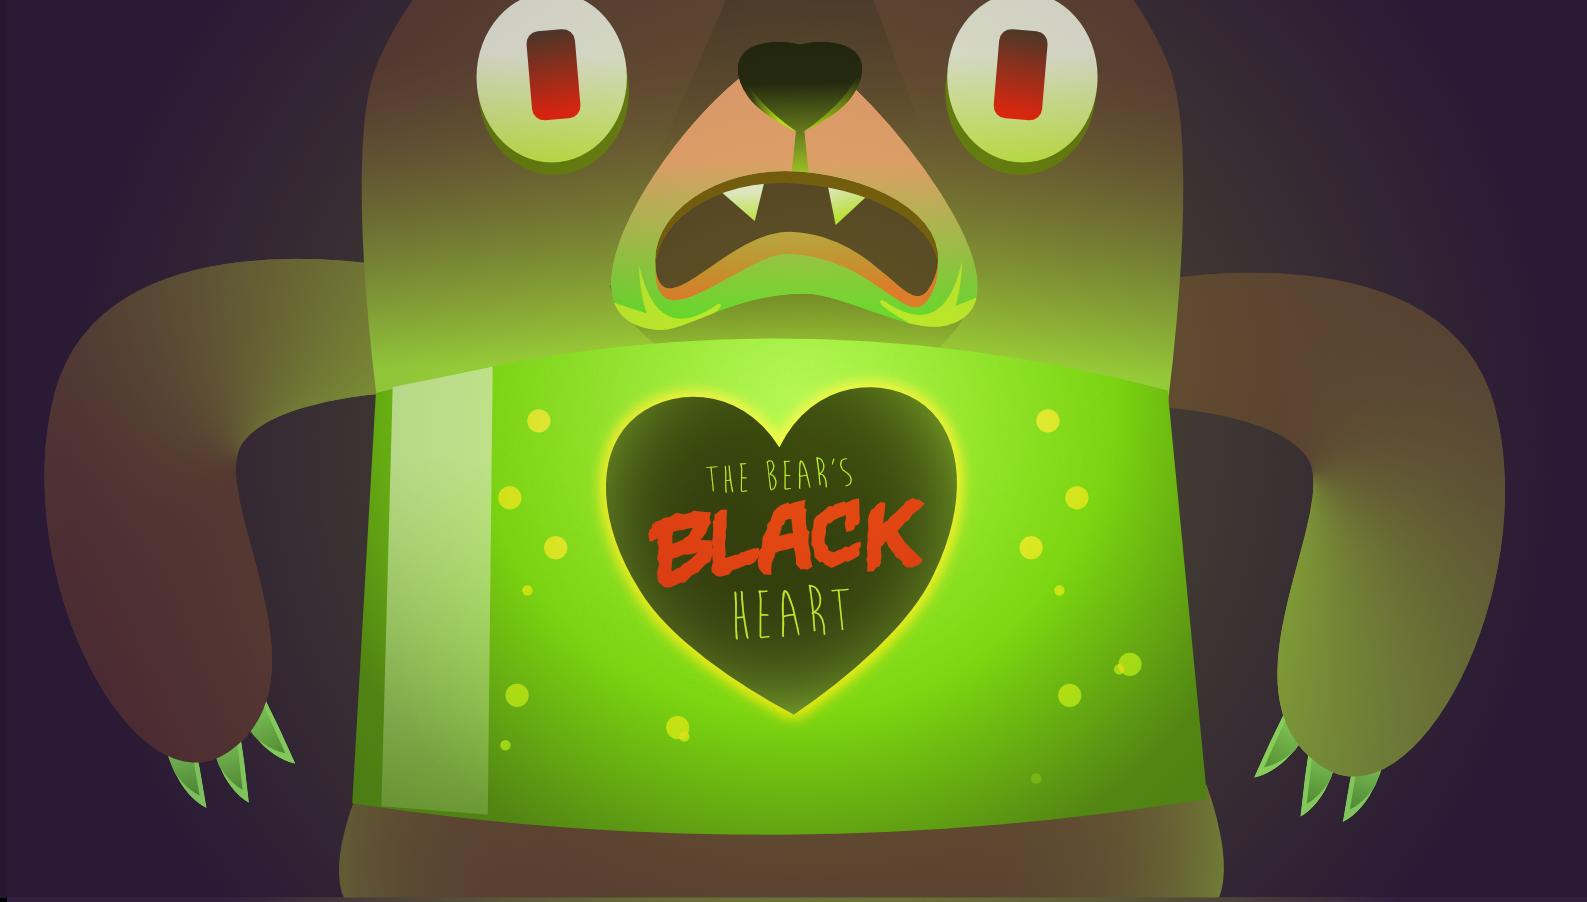 The Bear S Black Heart By Big Bad Studios